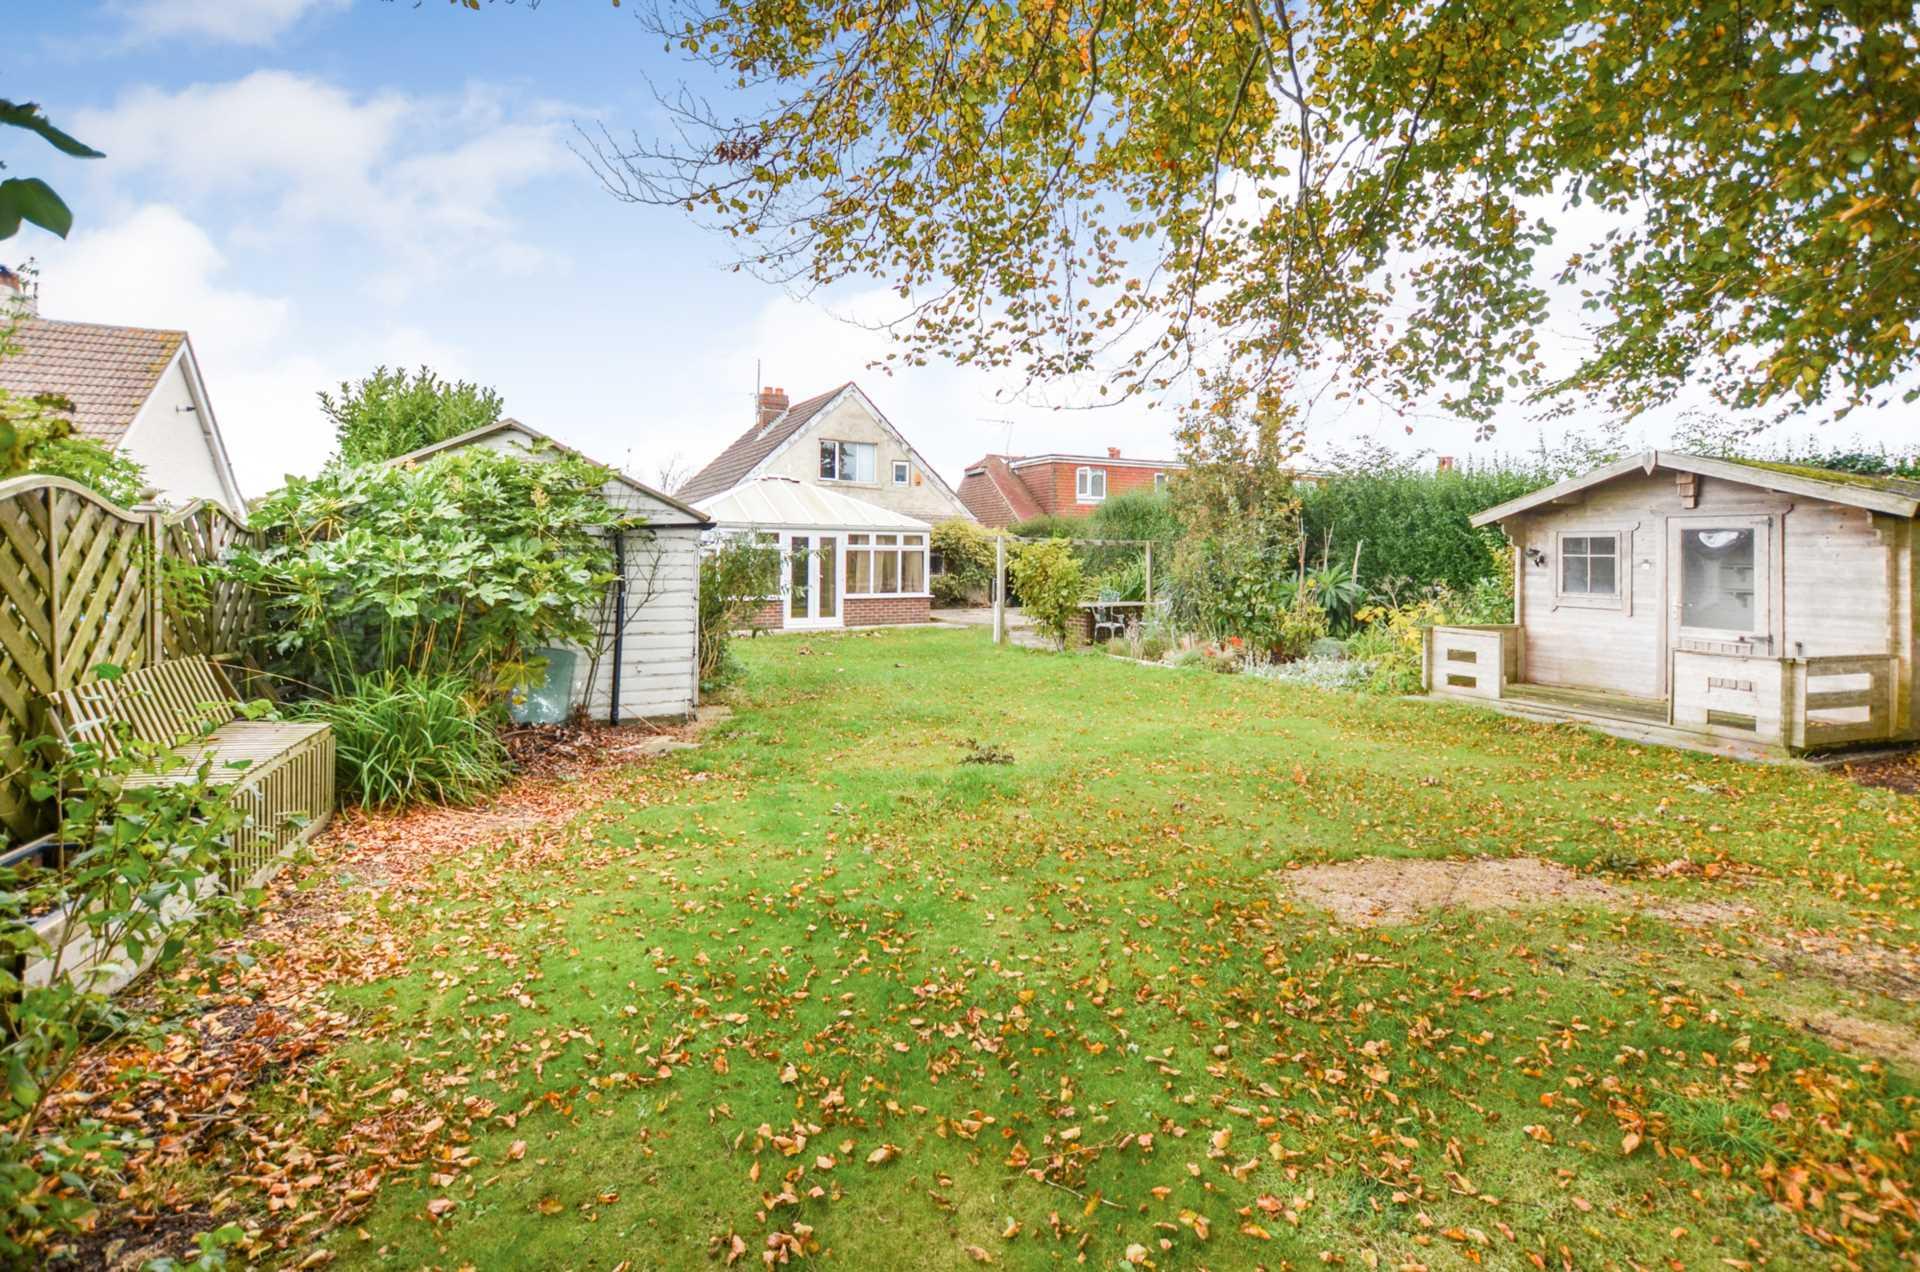 Birdham Road, Donnington, Chichester, Image 14